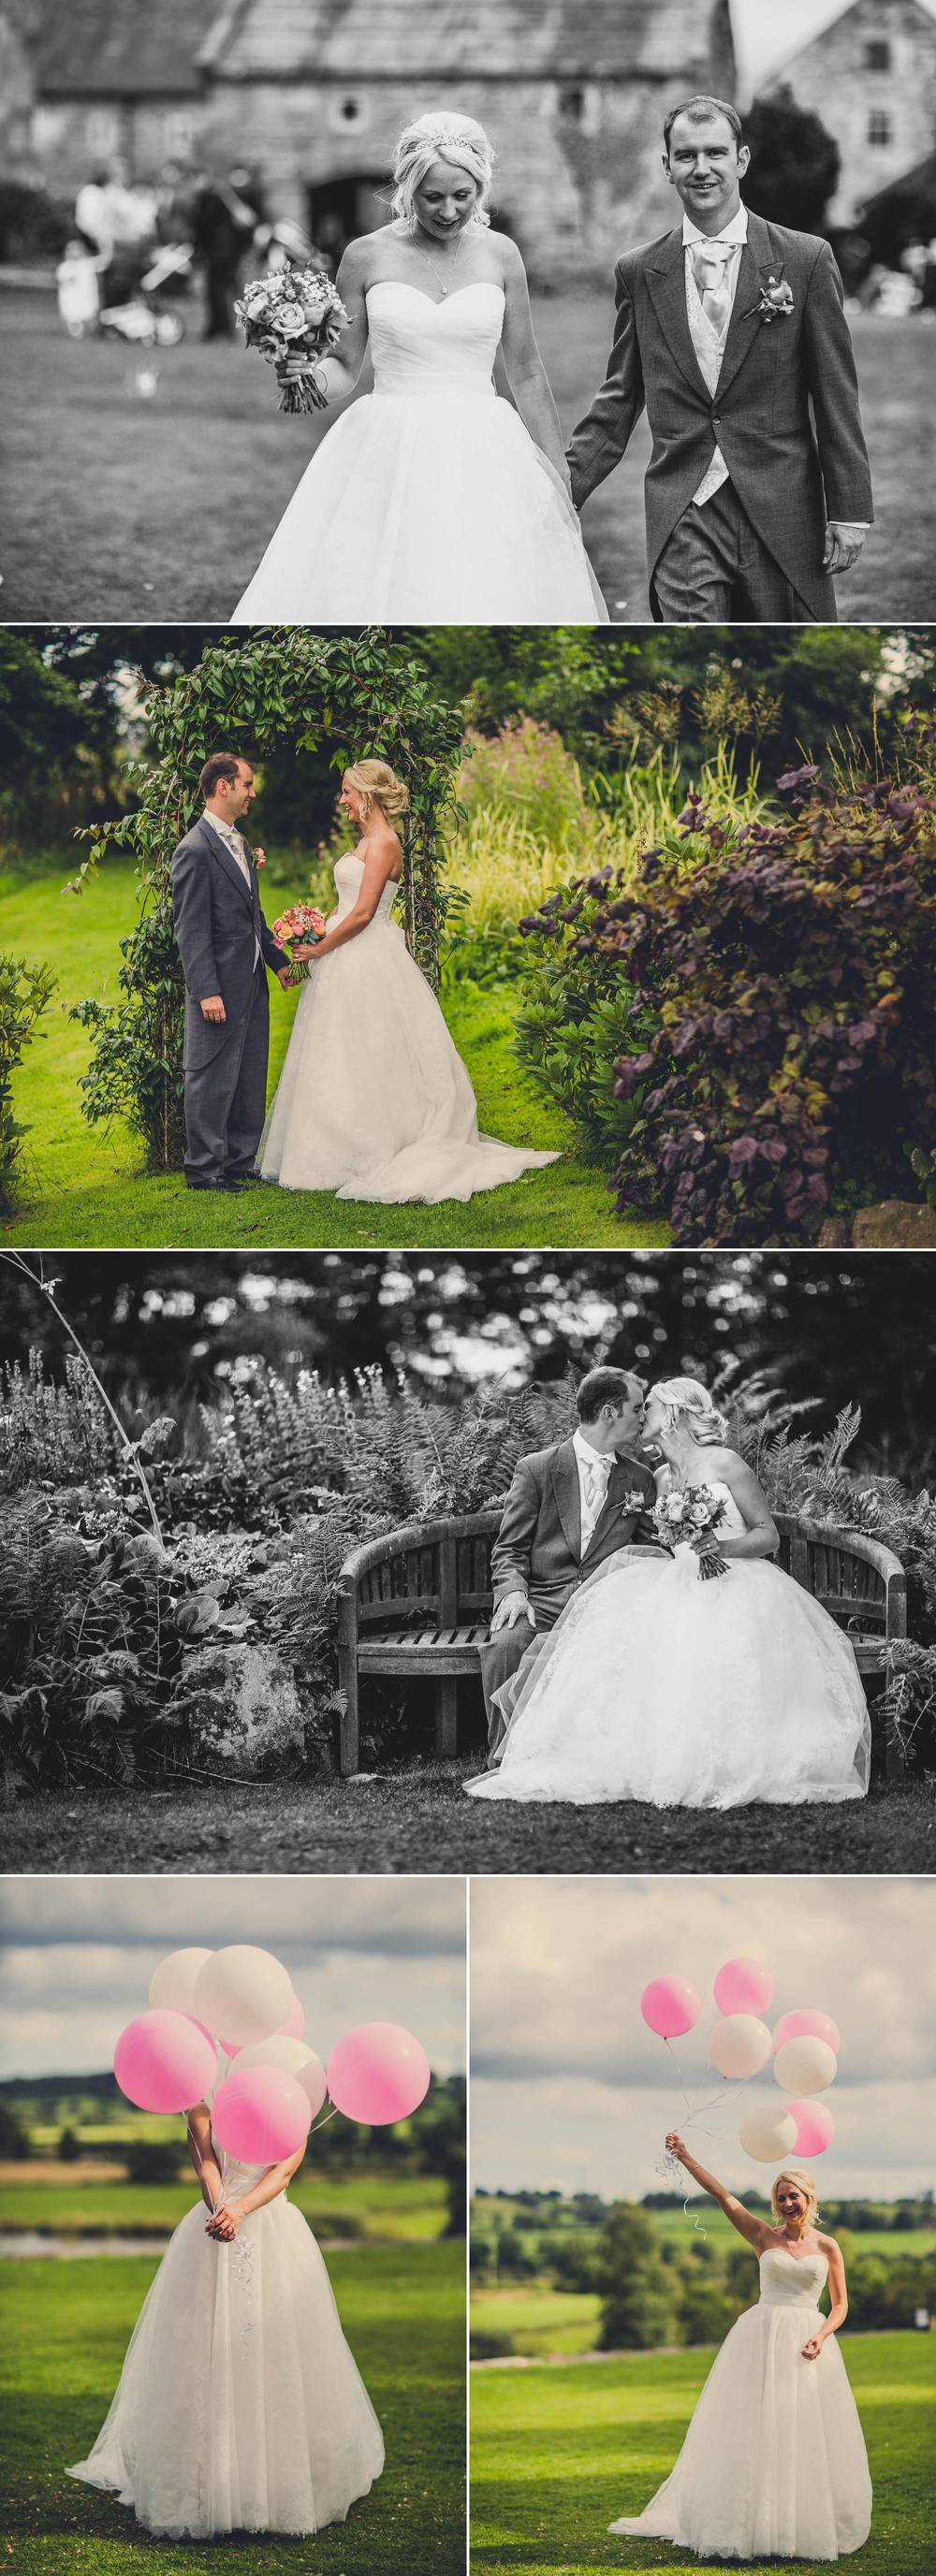 the-ashes-wedding-photographer 13.jpg